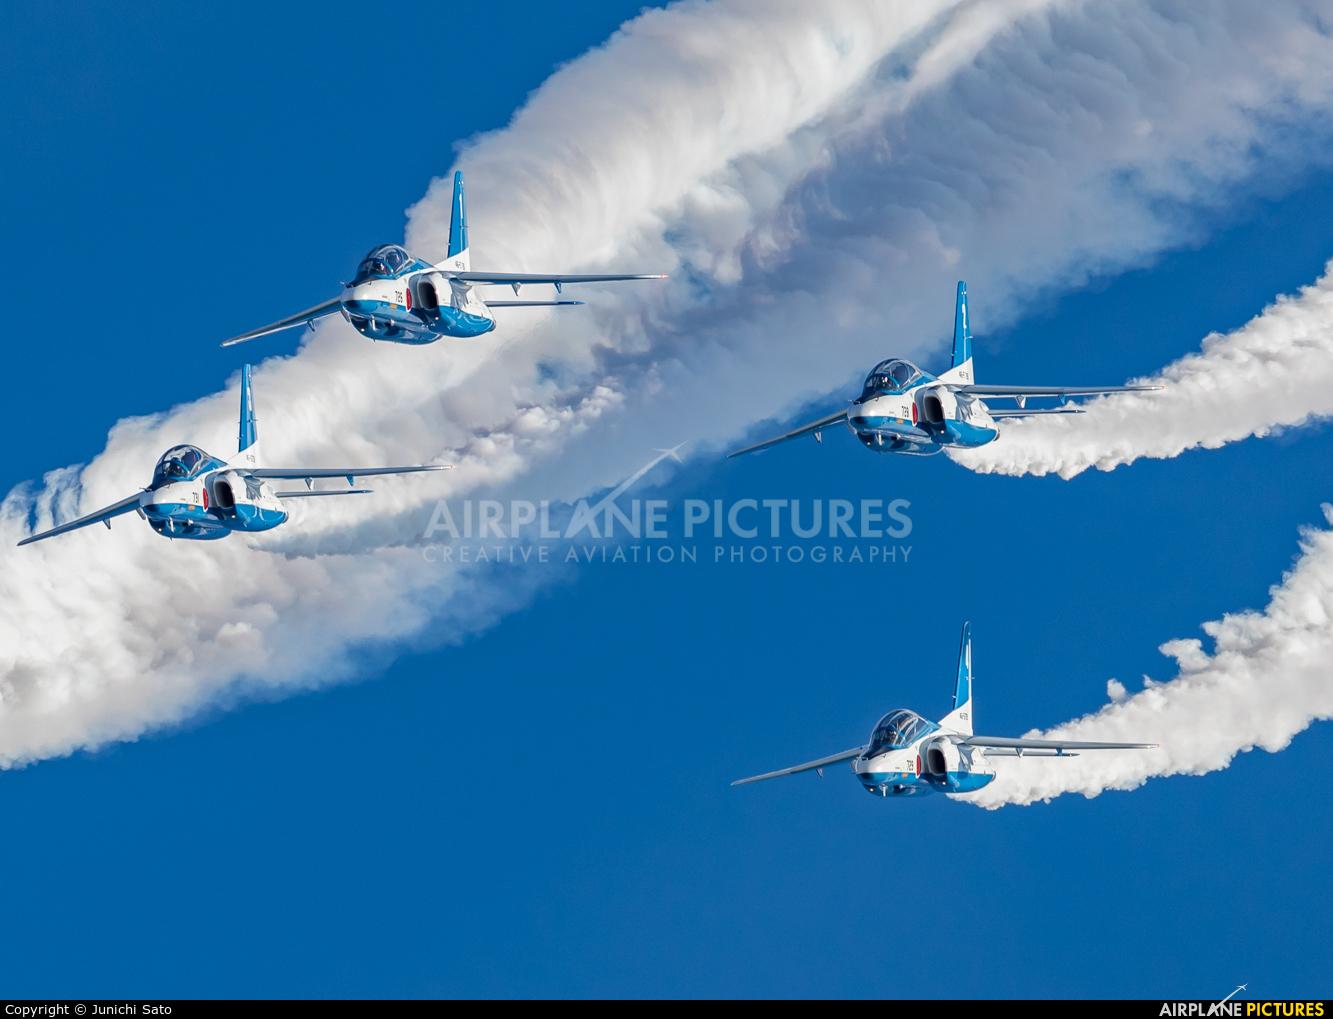 Japan - ASDF: Blue Impulse 46-5726 aircraft at Iruma AB